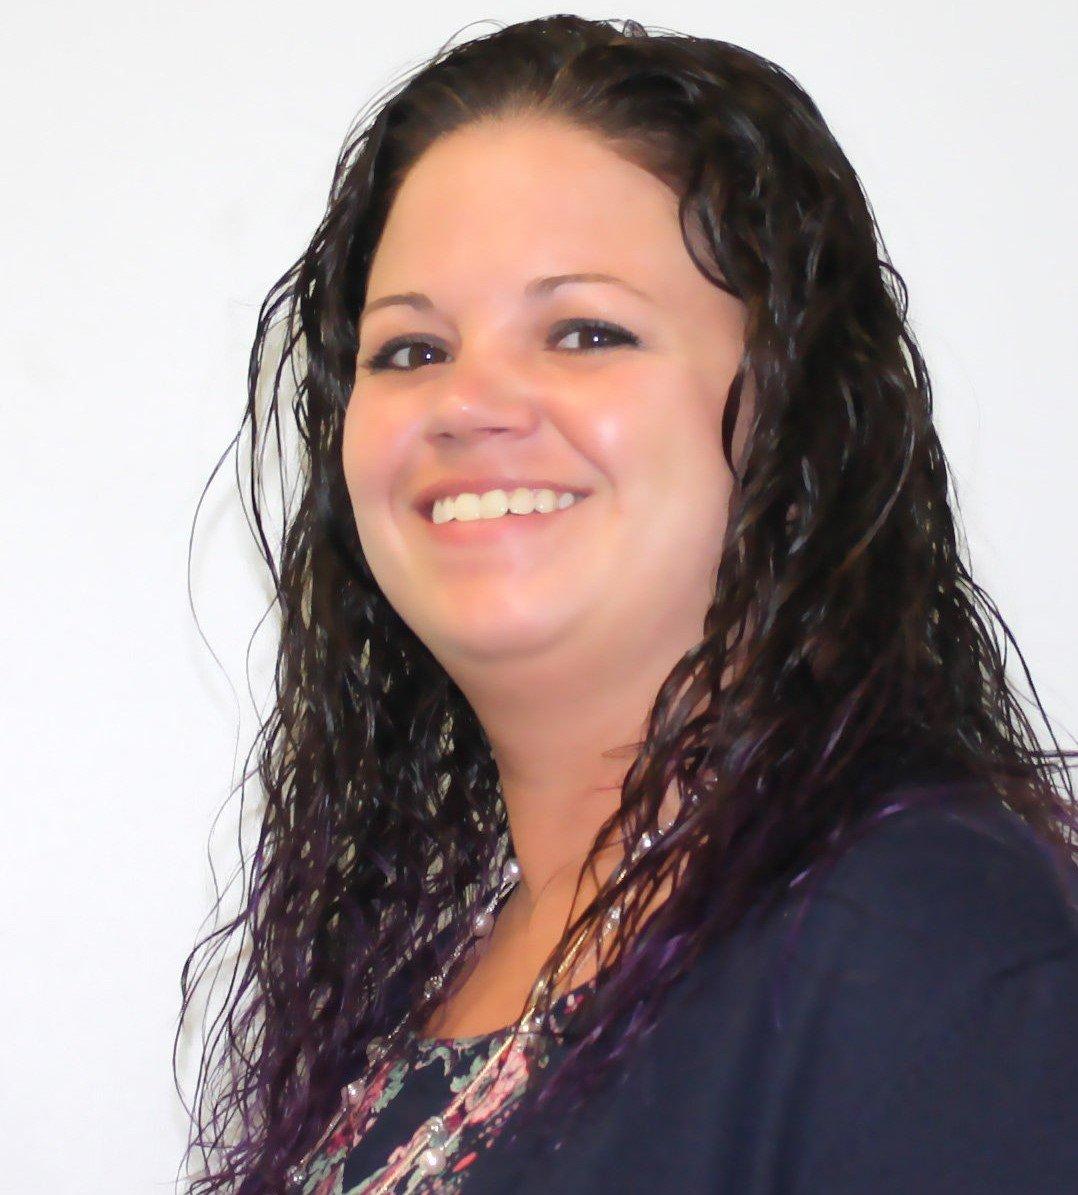 Tiffany Maiwald - Clerk/Bookkeeper